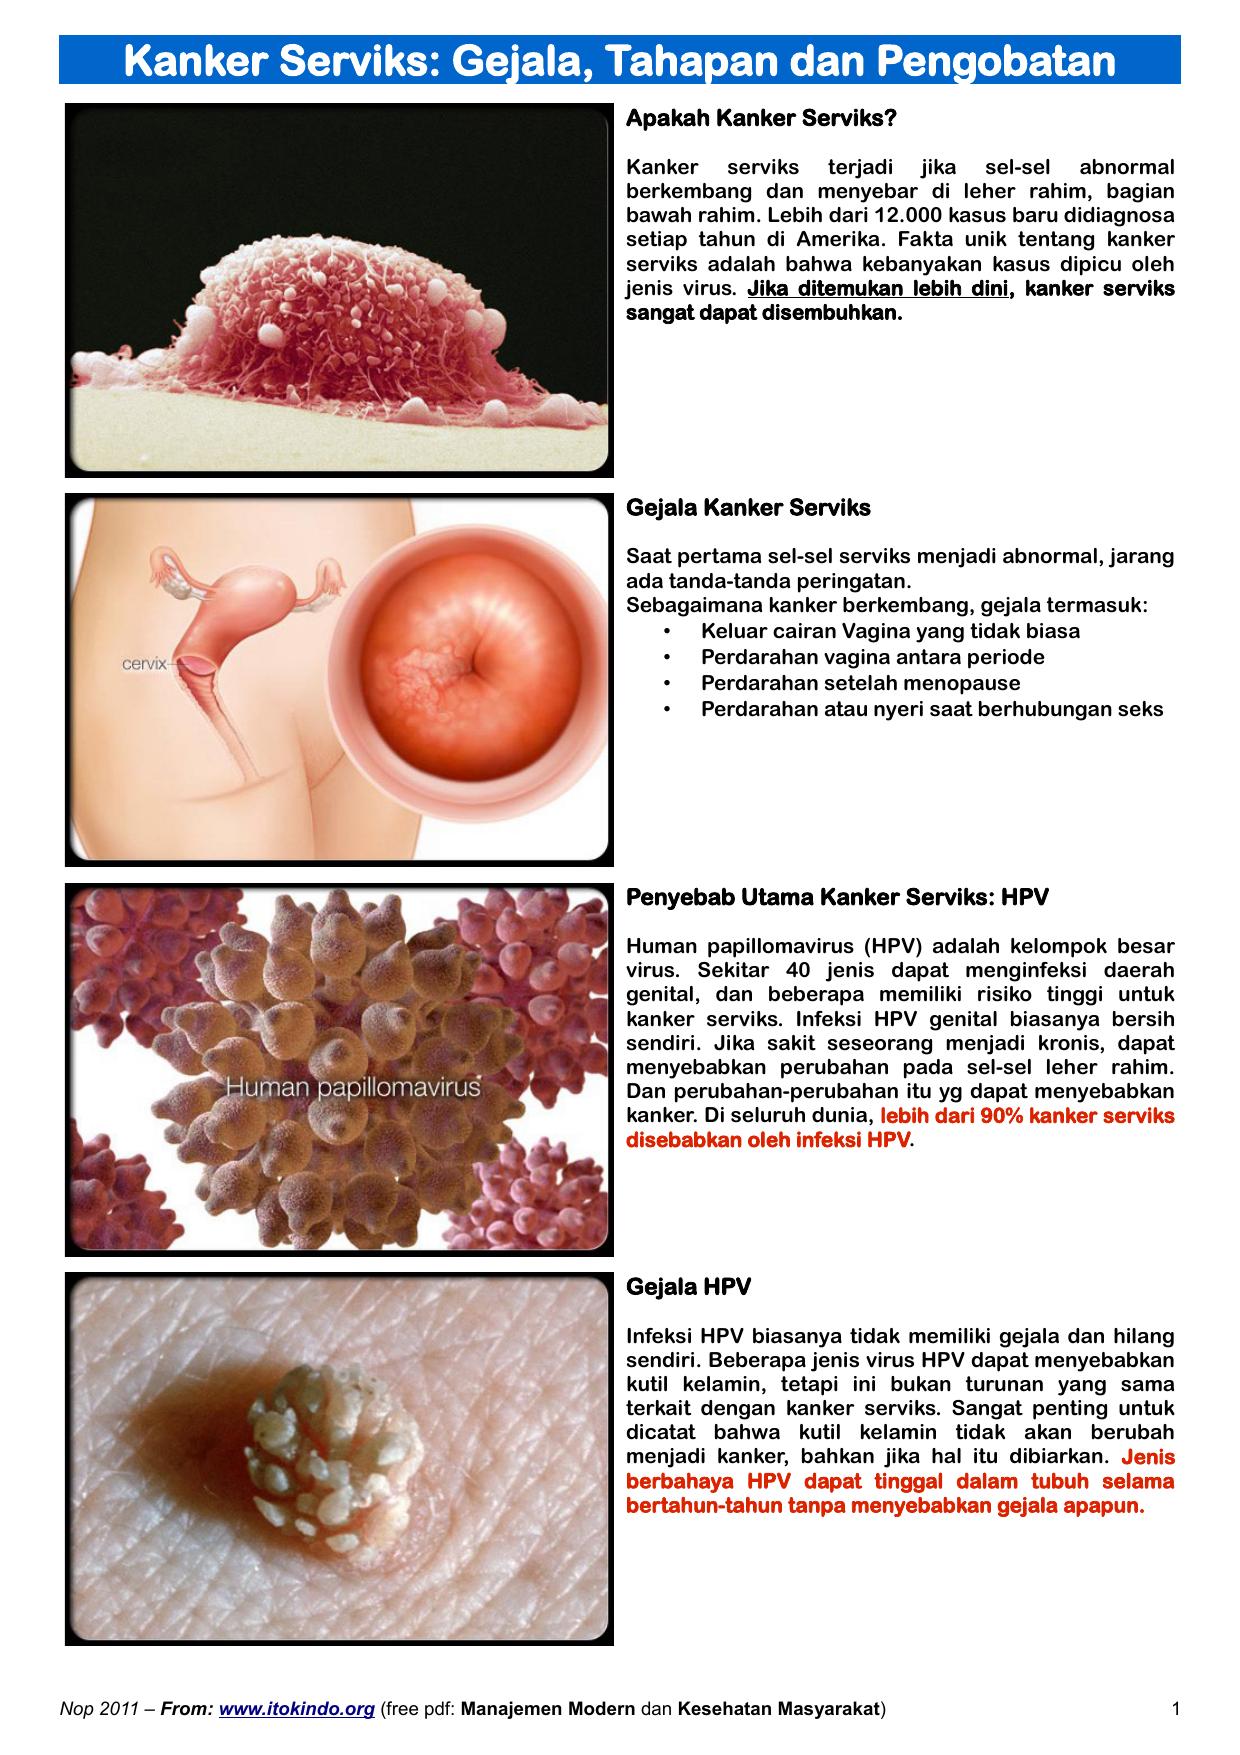 virus hpv yang menyebabkan kanker serviks)